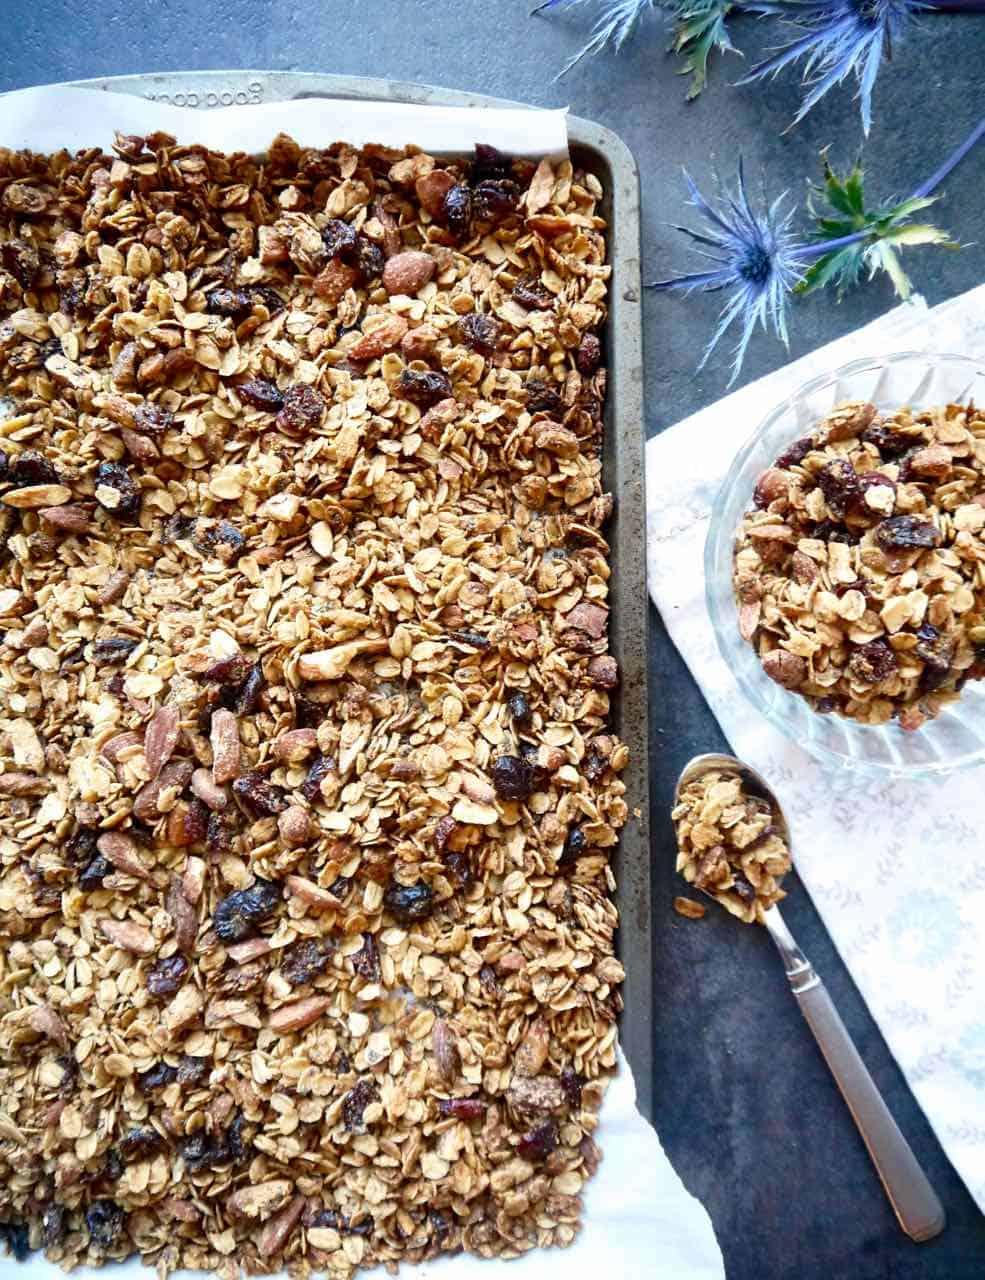 Gluten-free Chia-Almond Granola | Perchance to Cook, www.perchancetocook.com